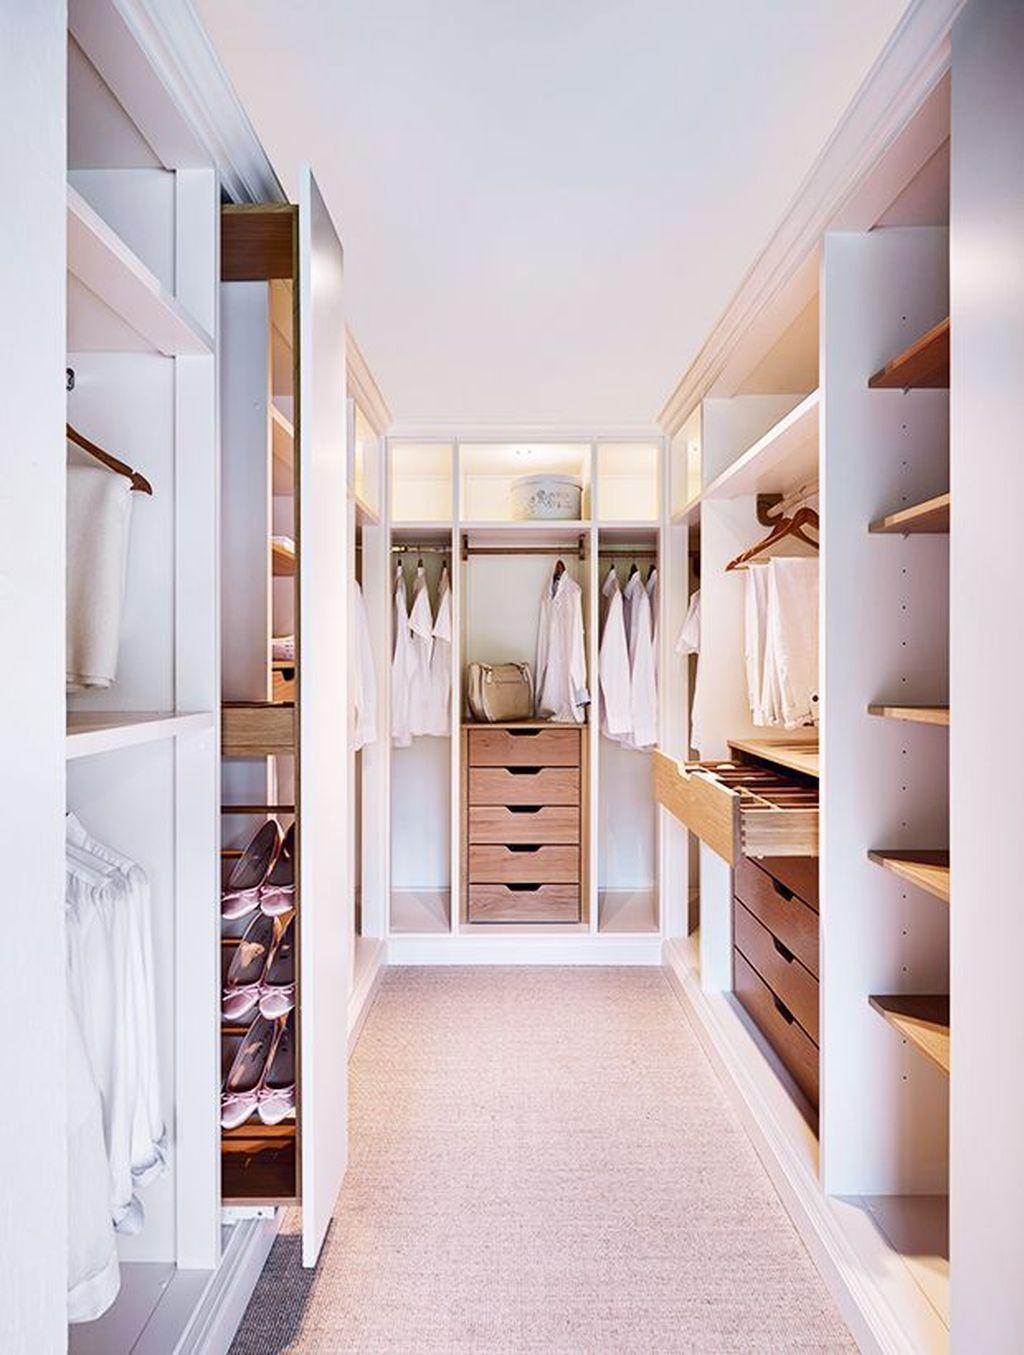 32 Master Bedroom And Bathroom Ideas Walk In Closet Inspiration